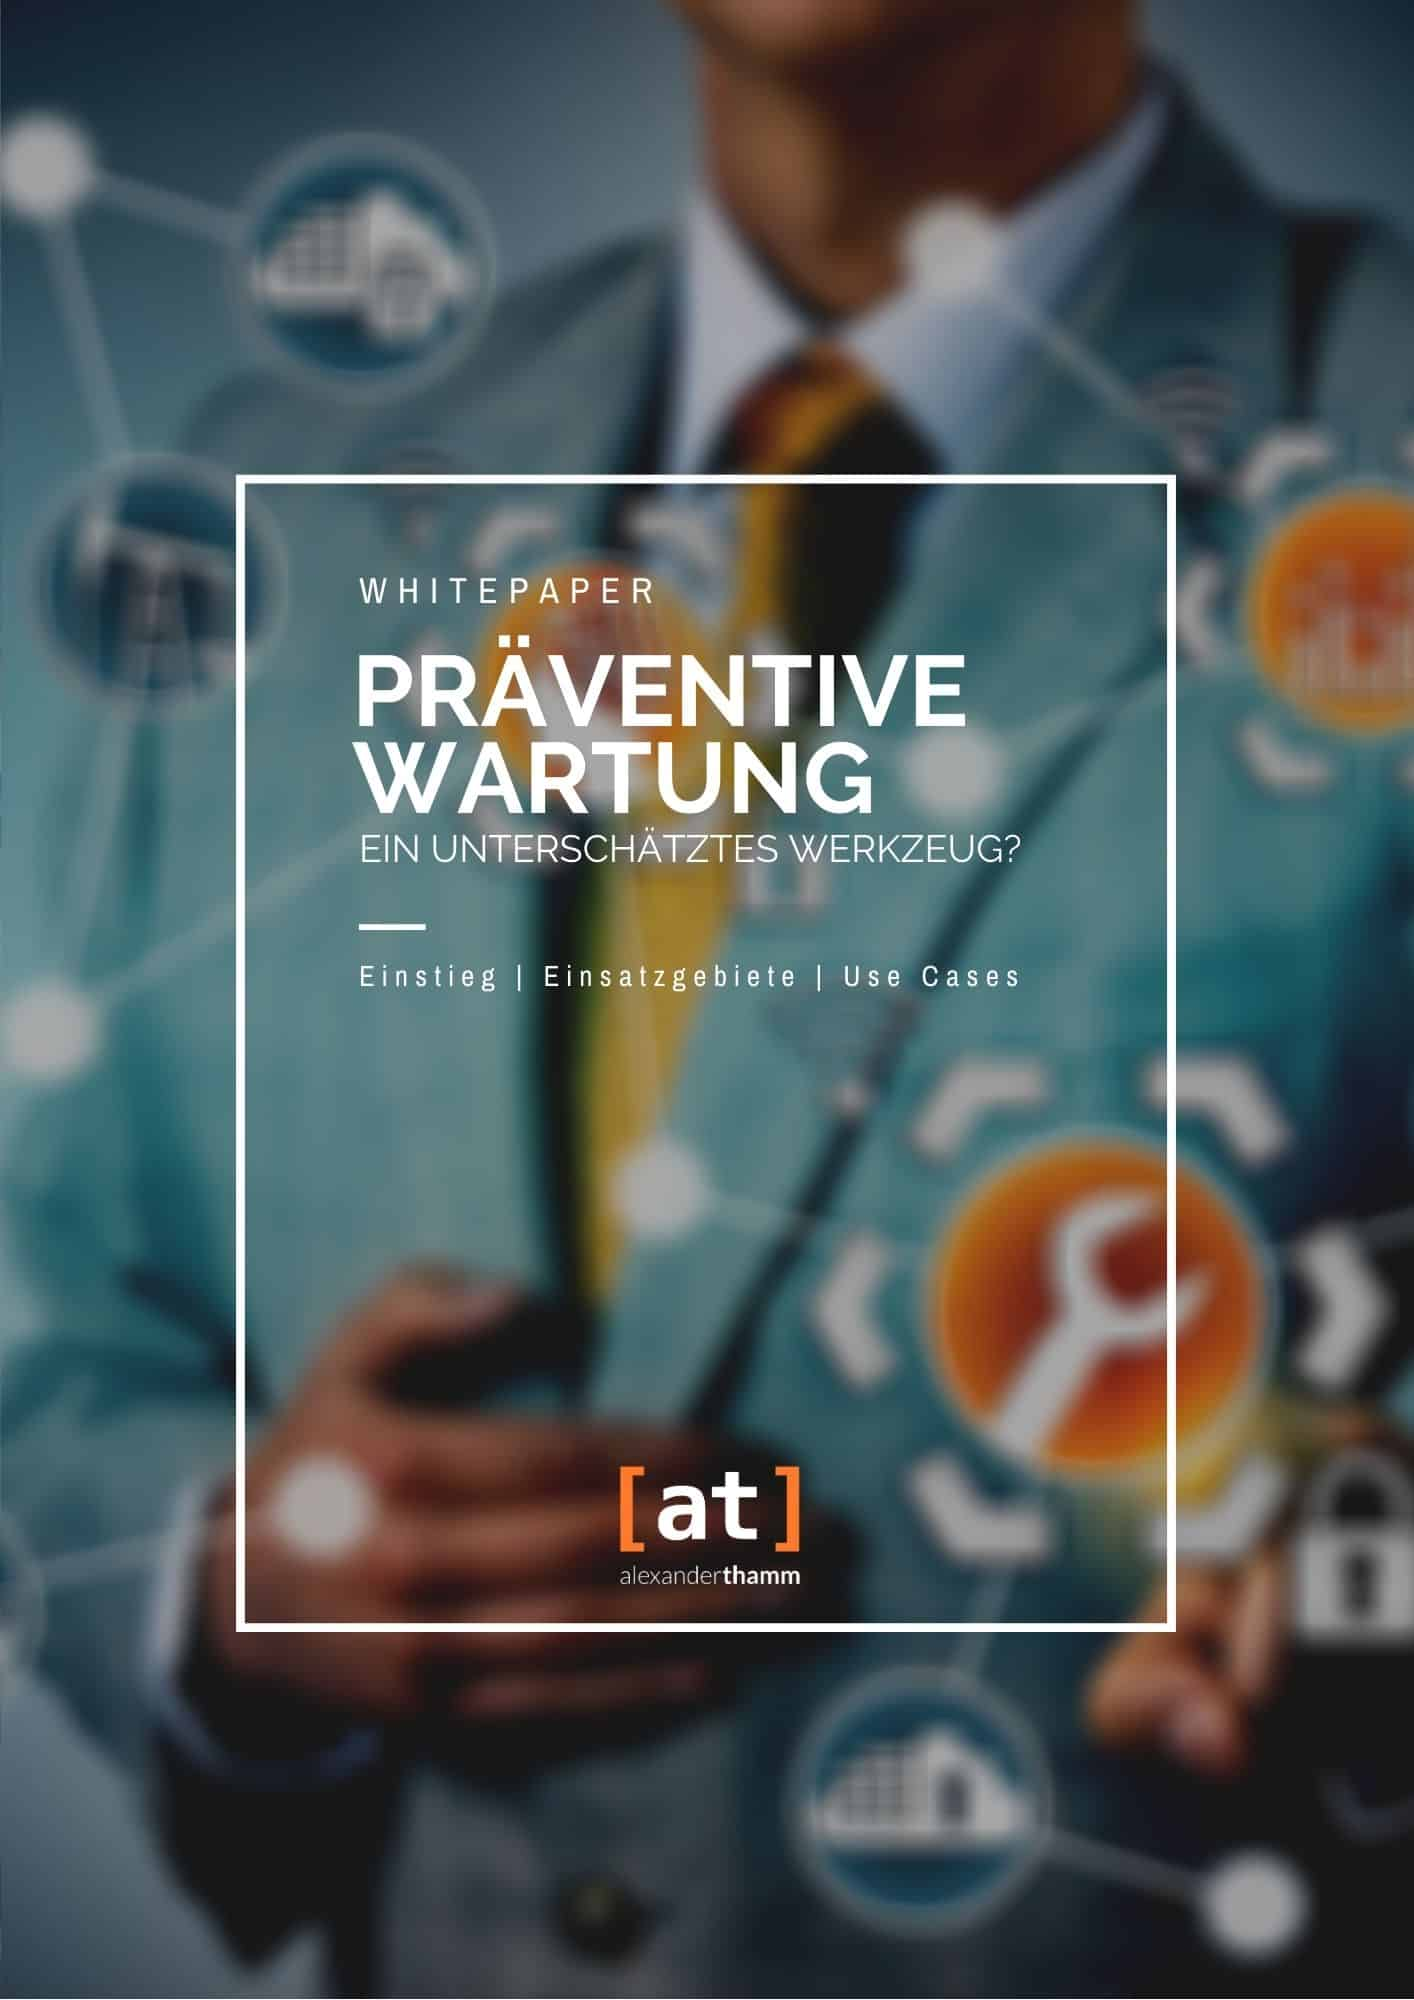 Whiteapaper_ Präventive Wartung